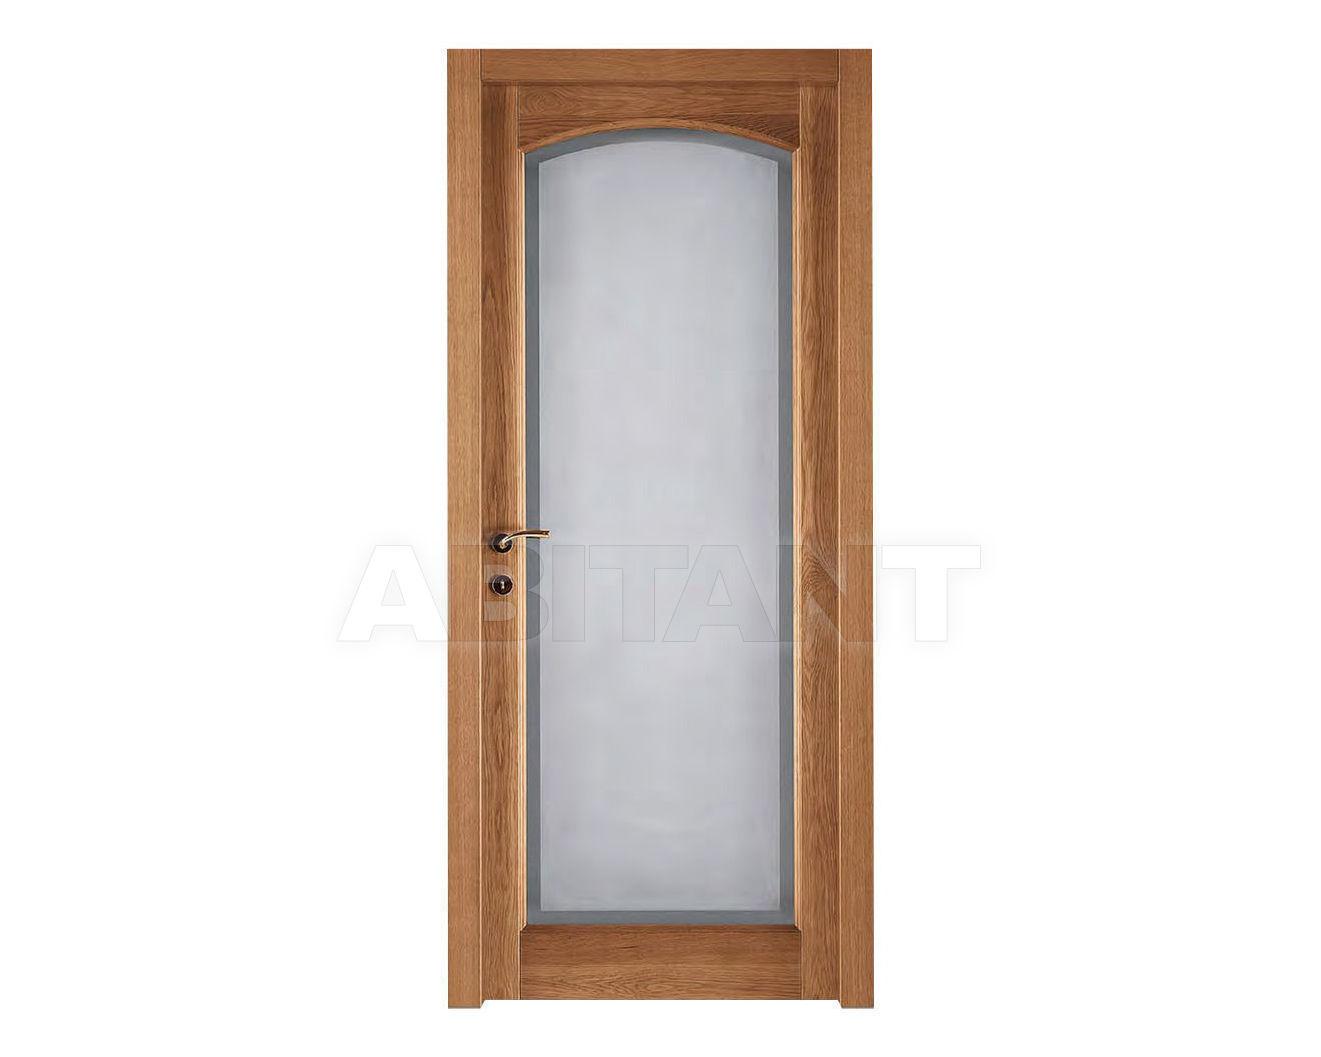 Купить Дверь деревянная Fioravazzi Classiche ARIANNA 11 VETRO